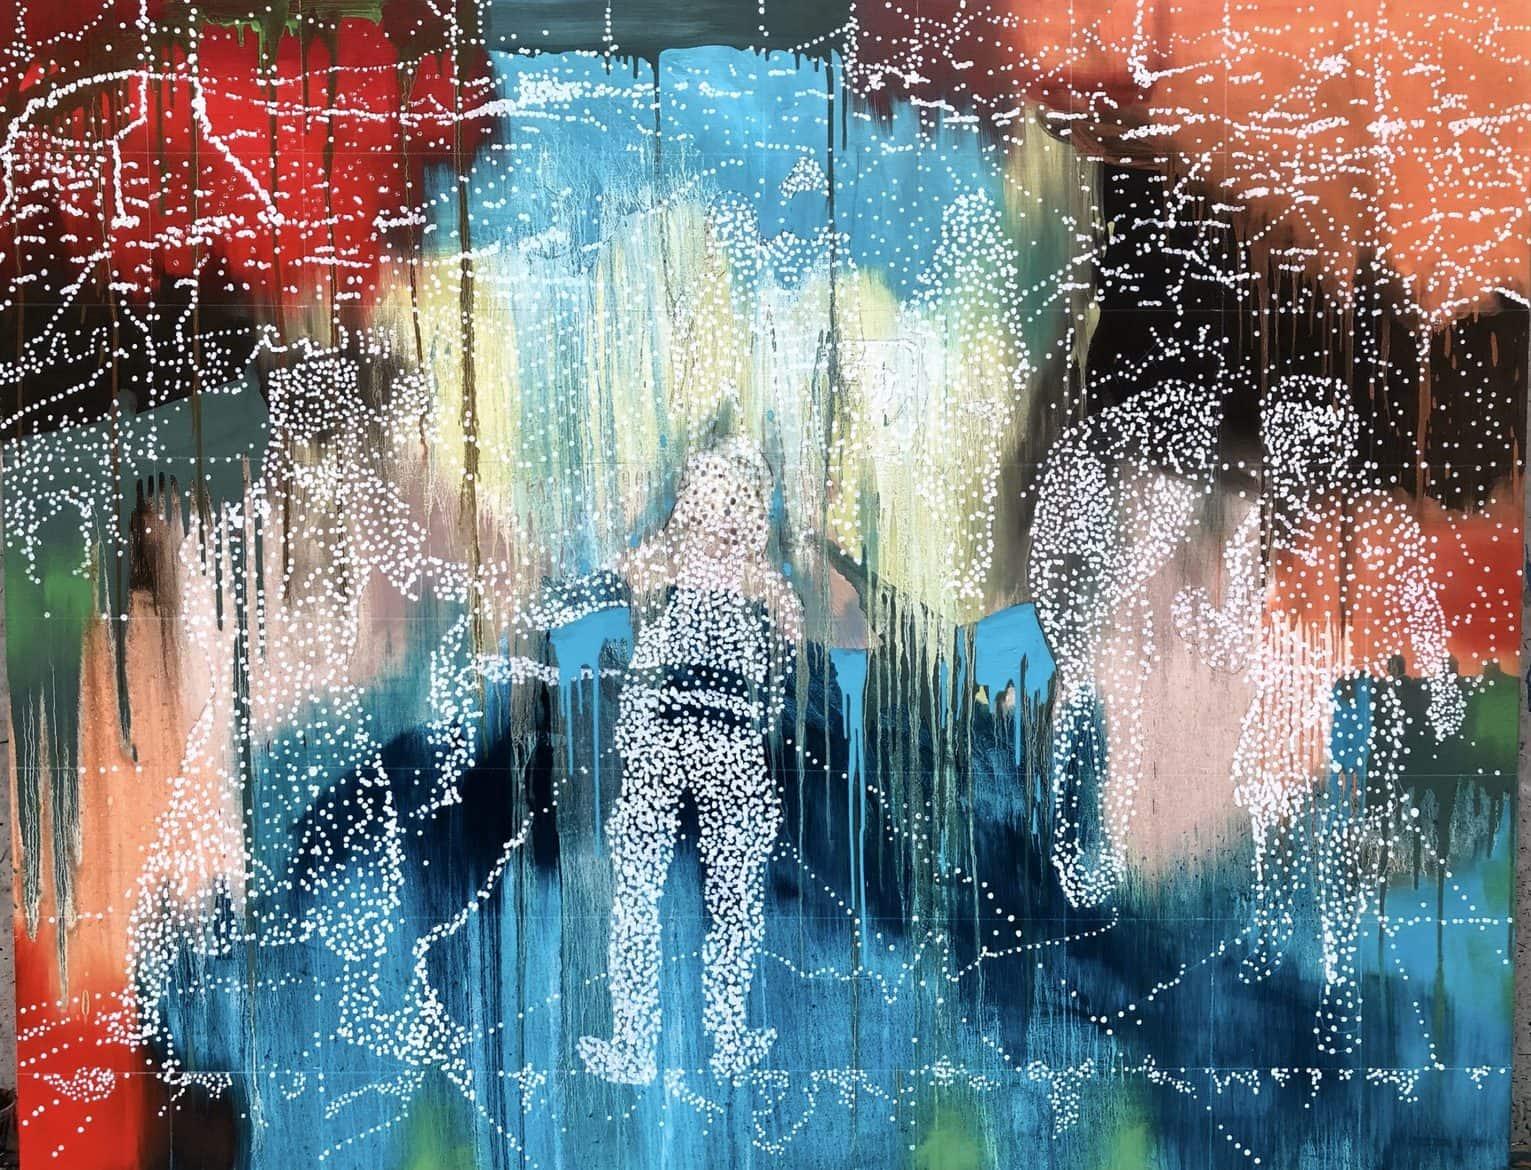 Jon Cattapan, 'Constellation Group No 3', 2019, Oil on linen, 140 x180cm